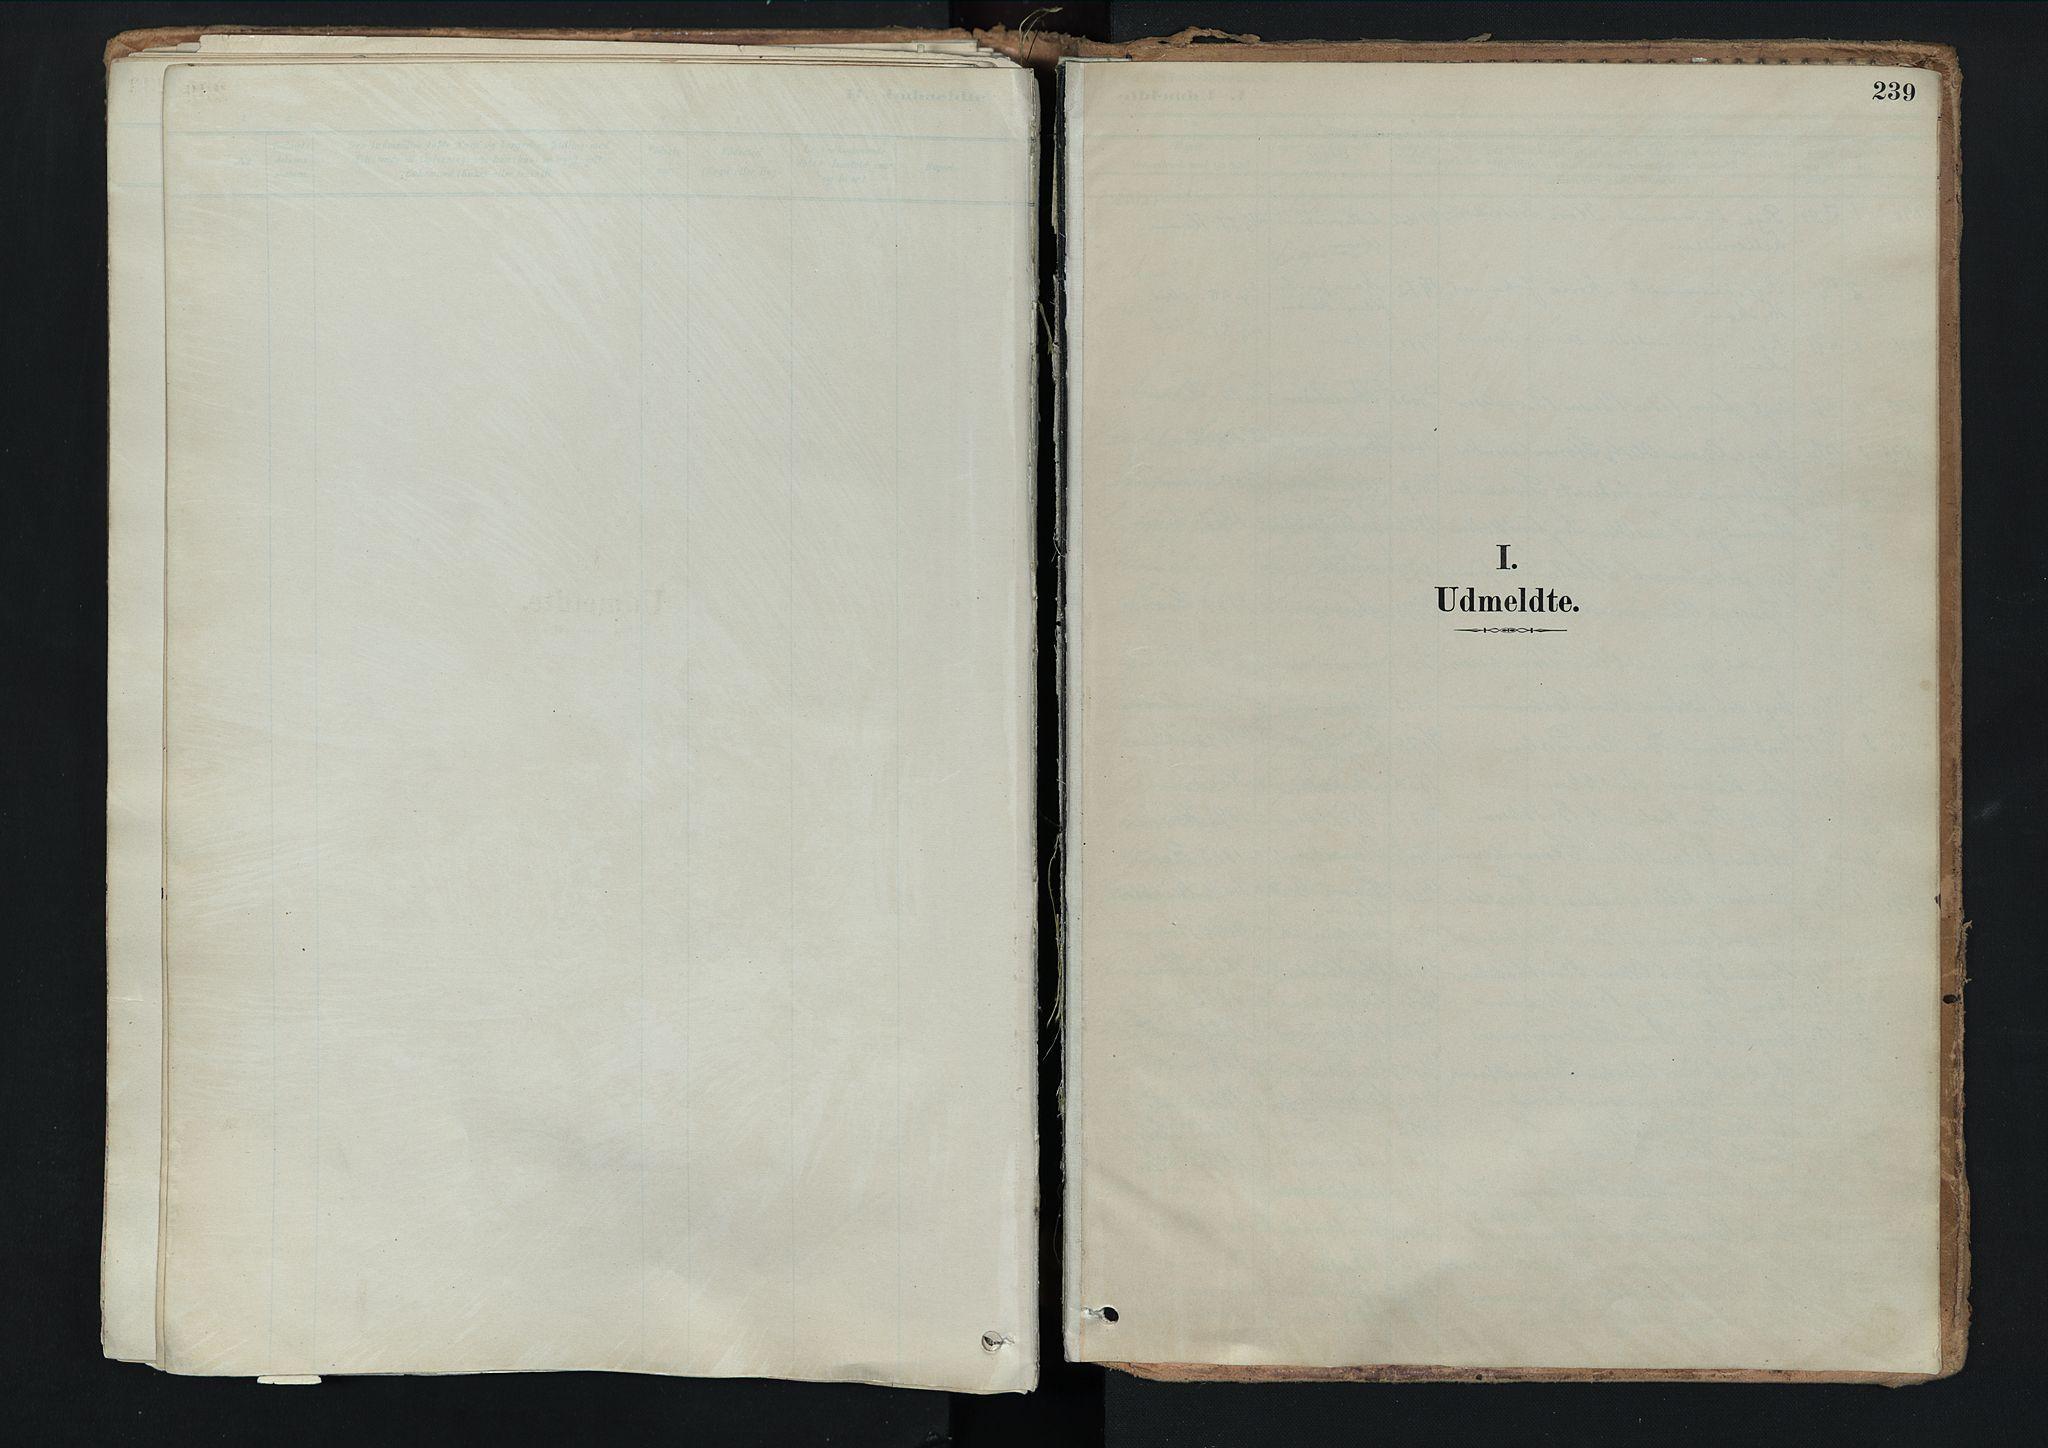 SAH, Nord-Fron prestekontor, Ministerialbok nr. 3, 1884-1914, s. 239